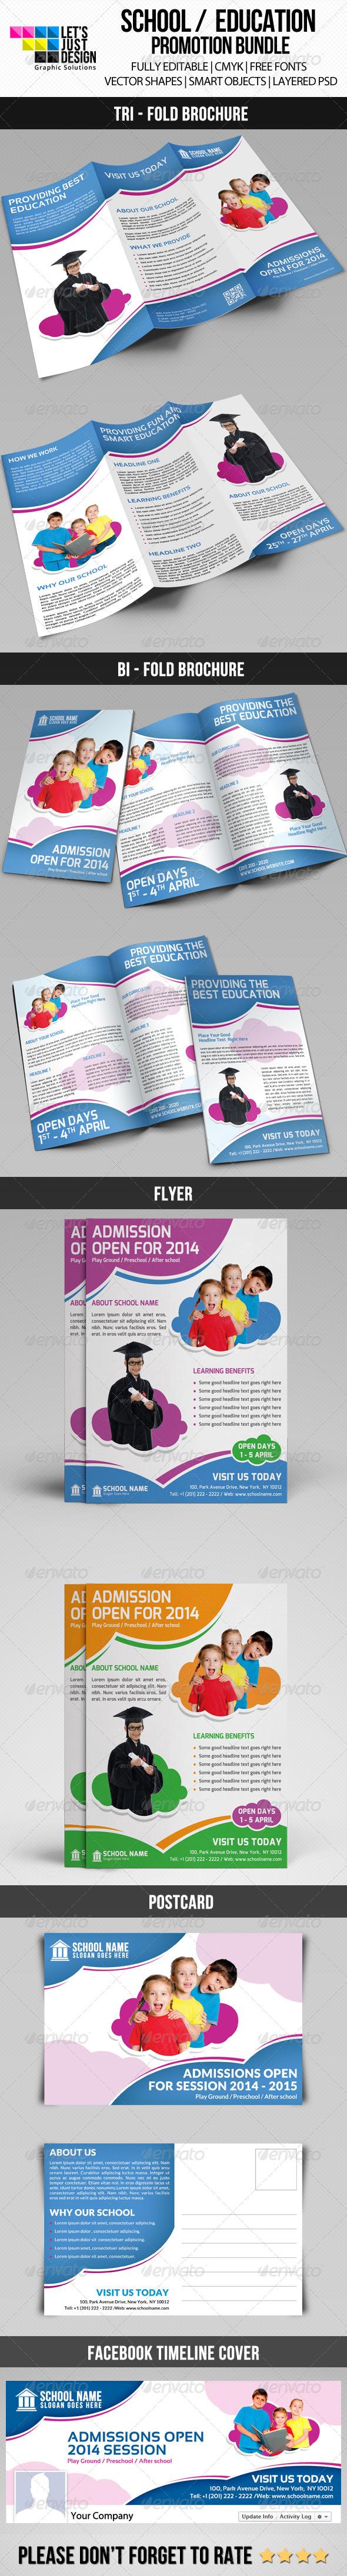 GraphicRiver School Promotion Material Bundle 7966469